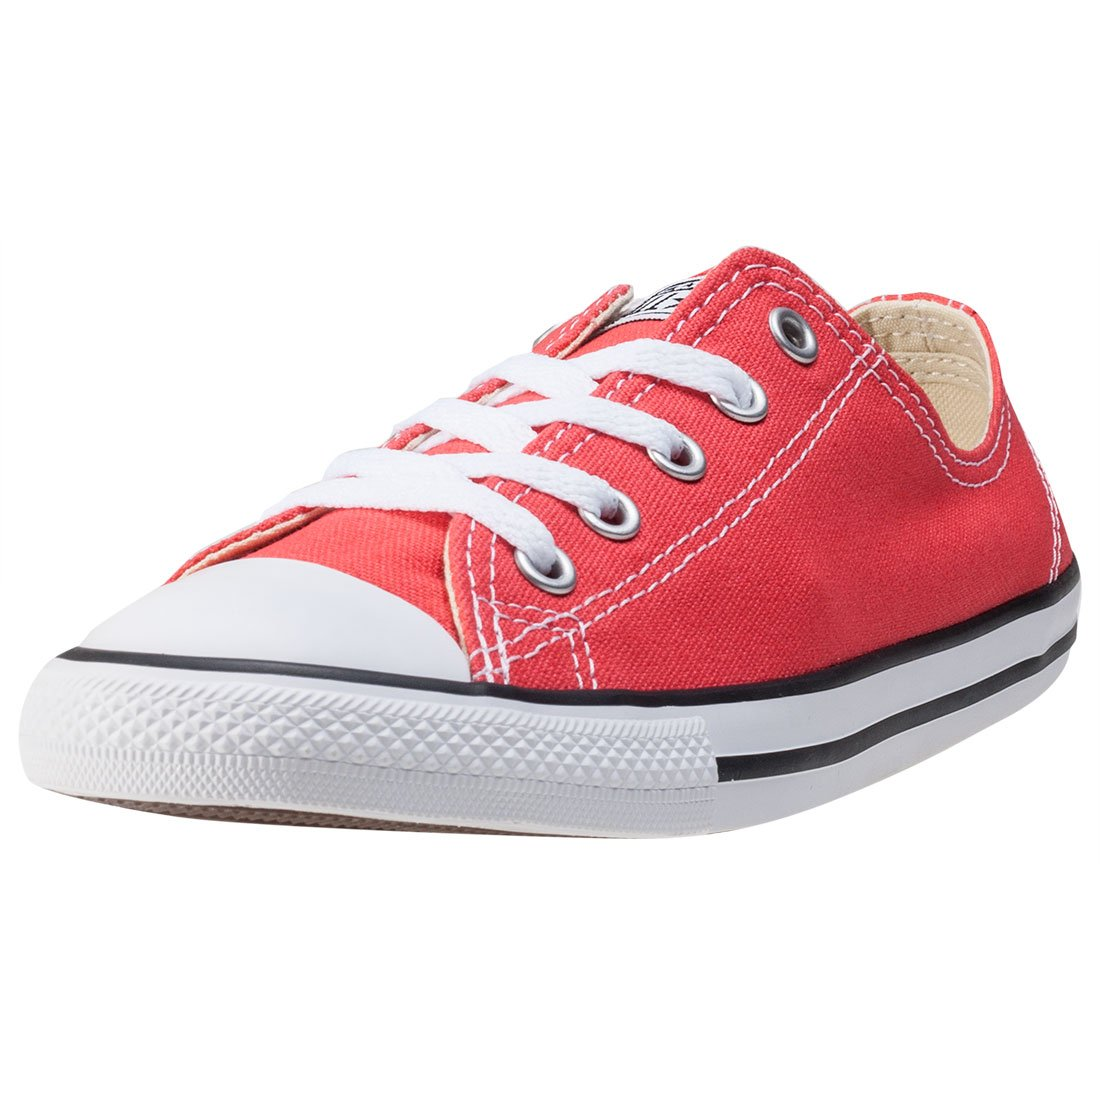 Converse As Dainty Femme Core Cvs Ox 202280 Damen Sneaker  41 EU|Rot